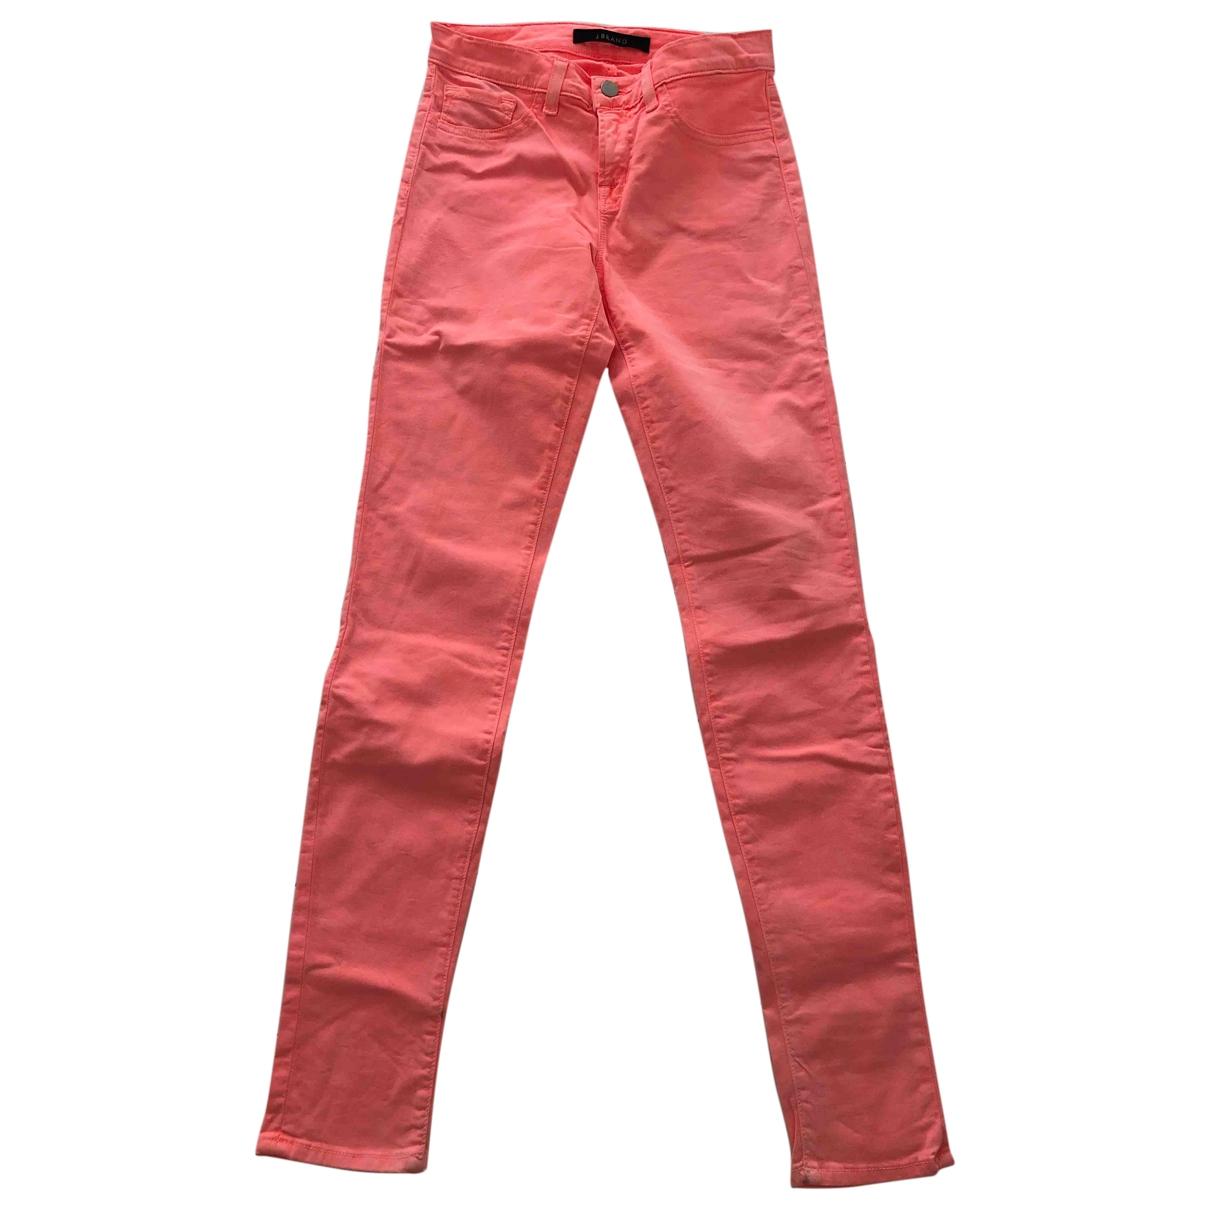 J Brand \N Orange Denim - Jeans Trousers for Women XS International